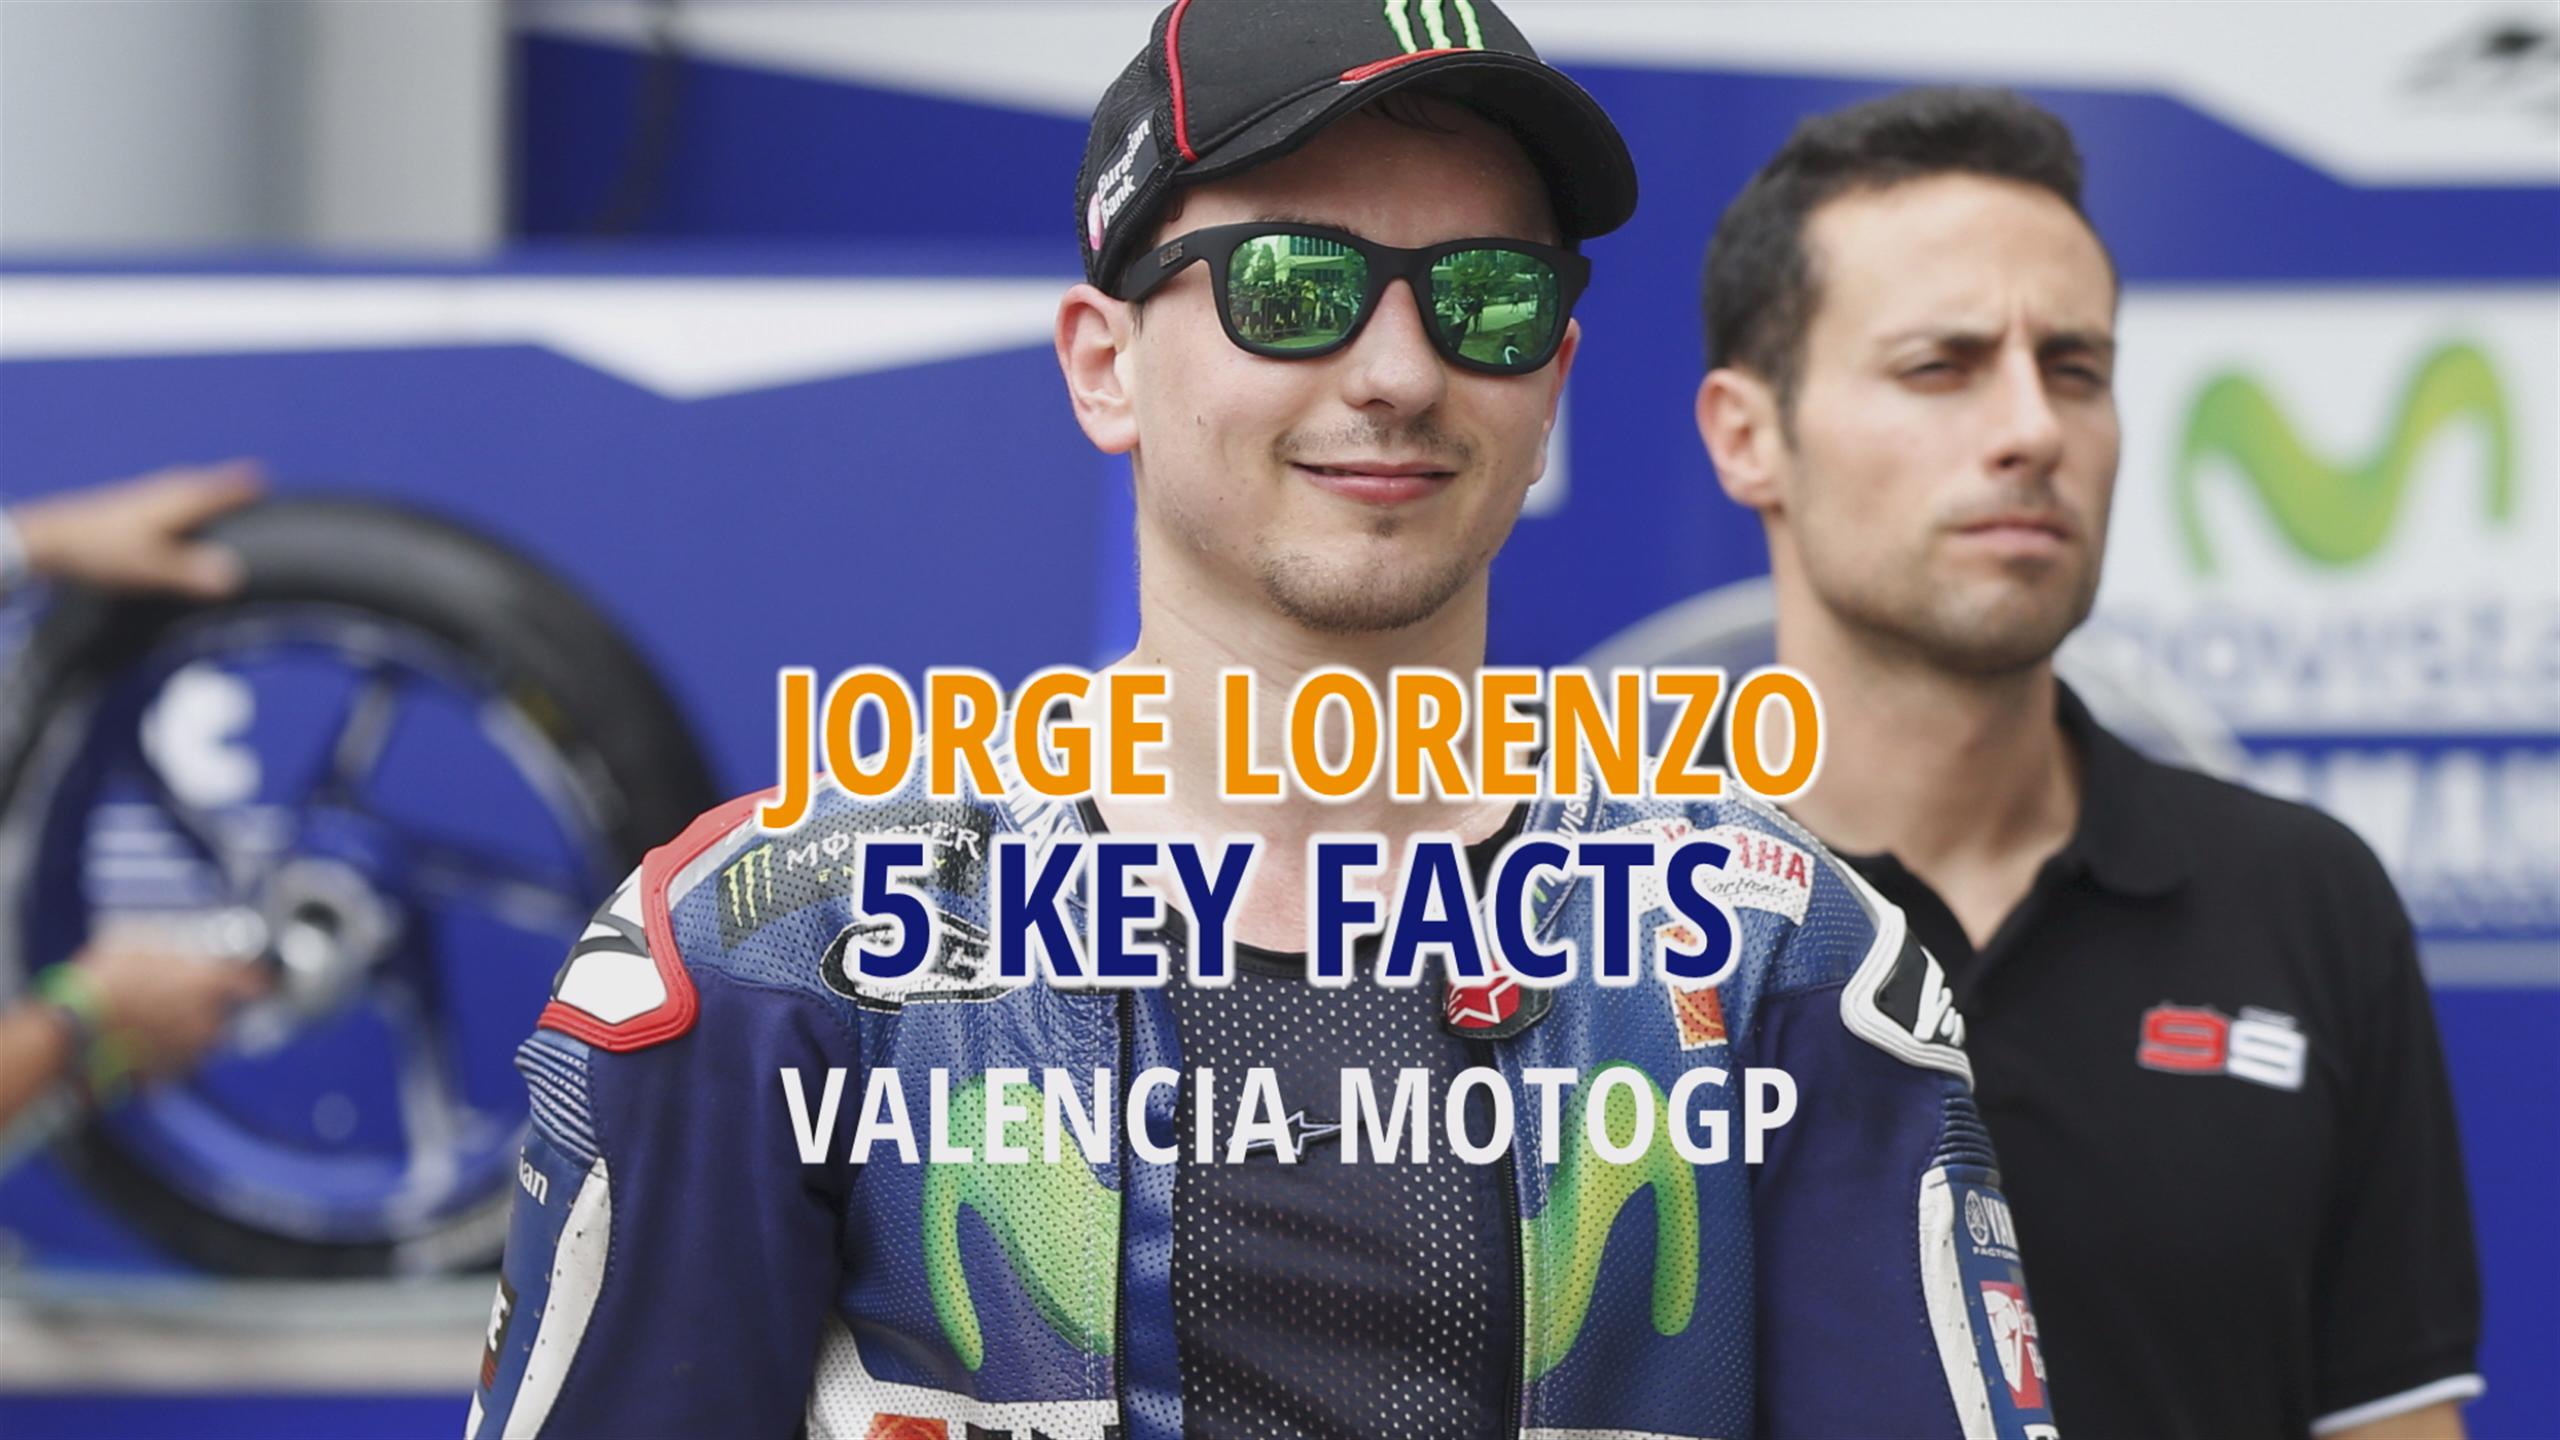 Jorge Lorenzo - 5 key stats for the Valencia MotoGP